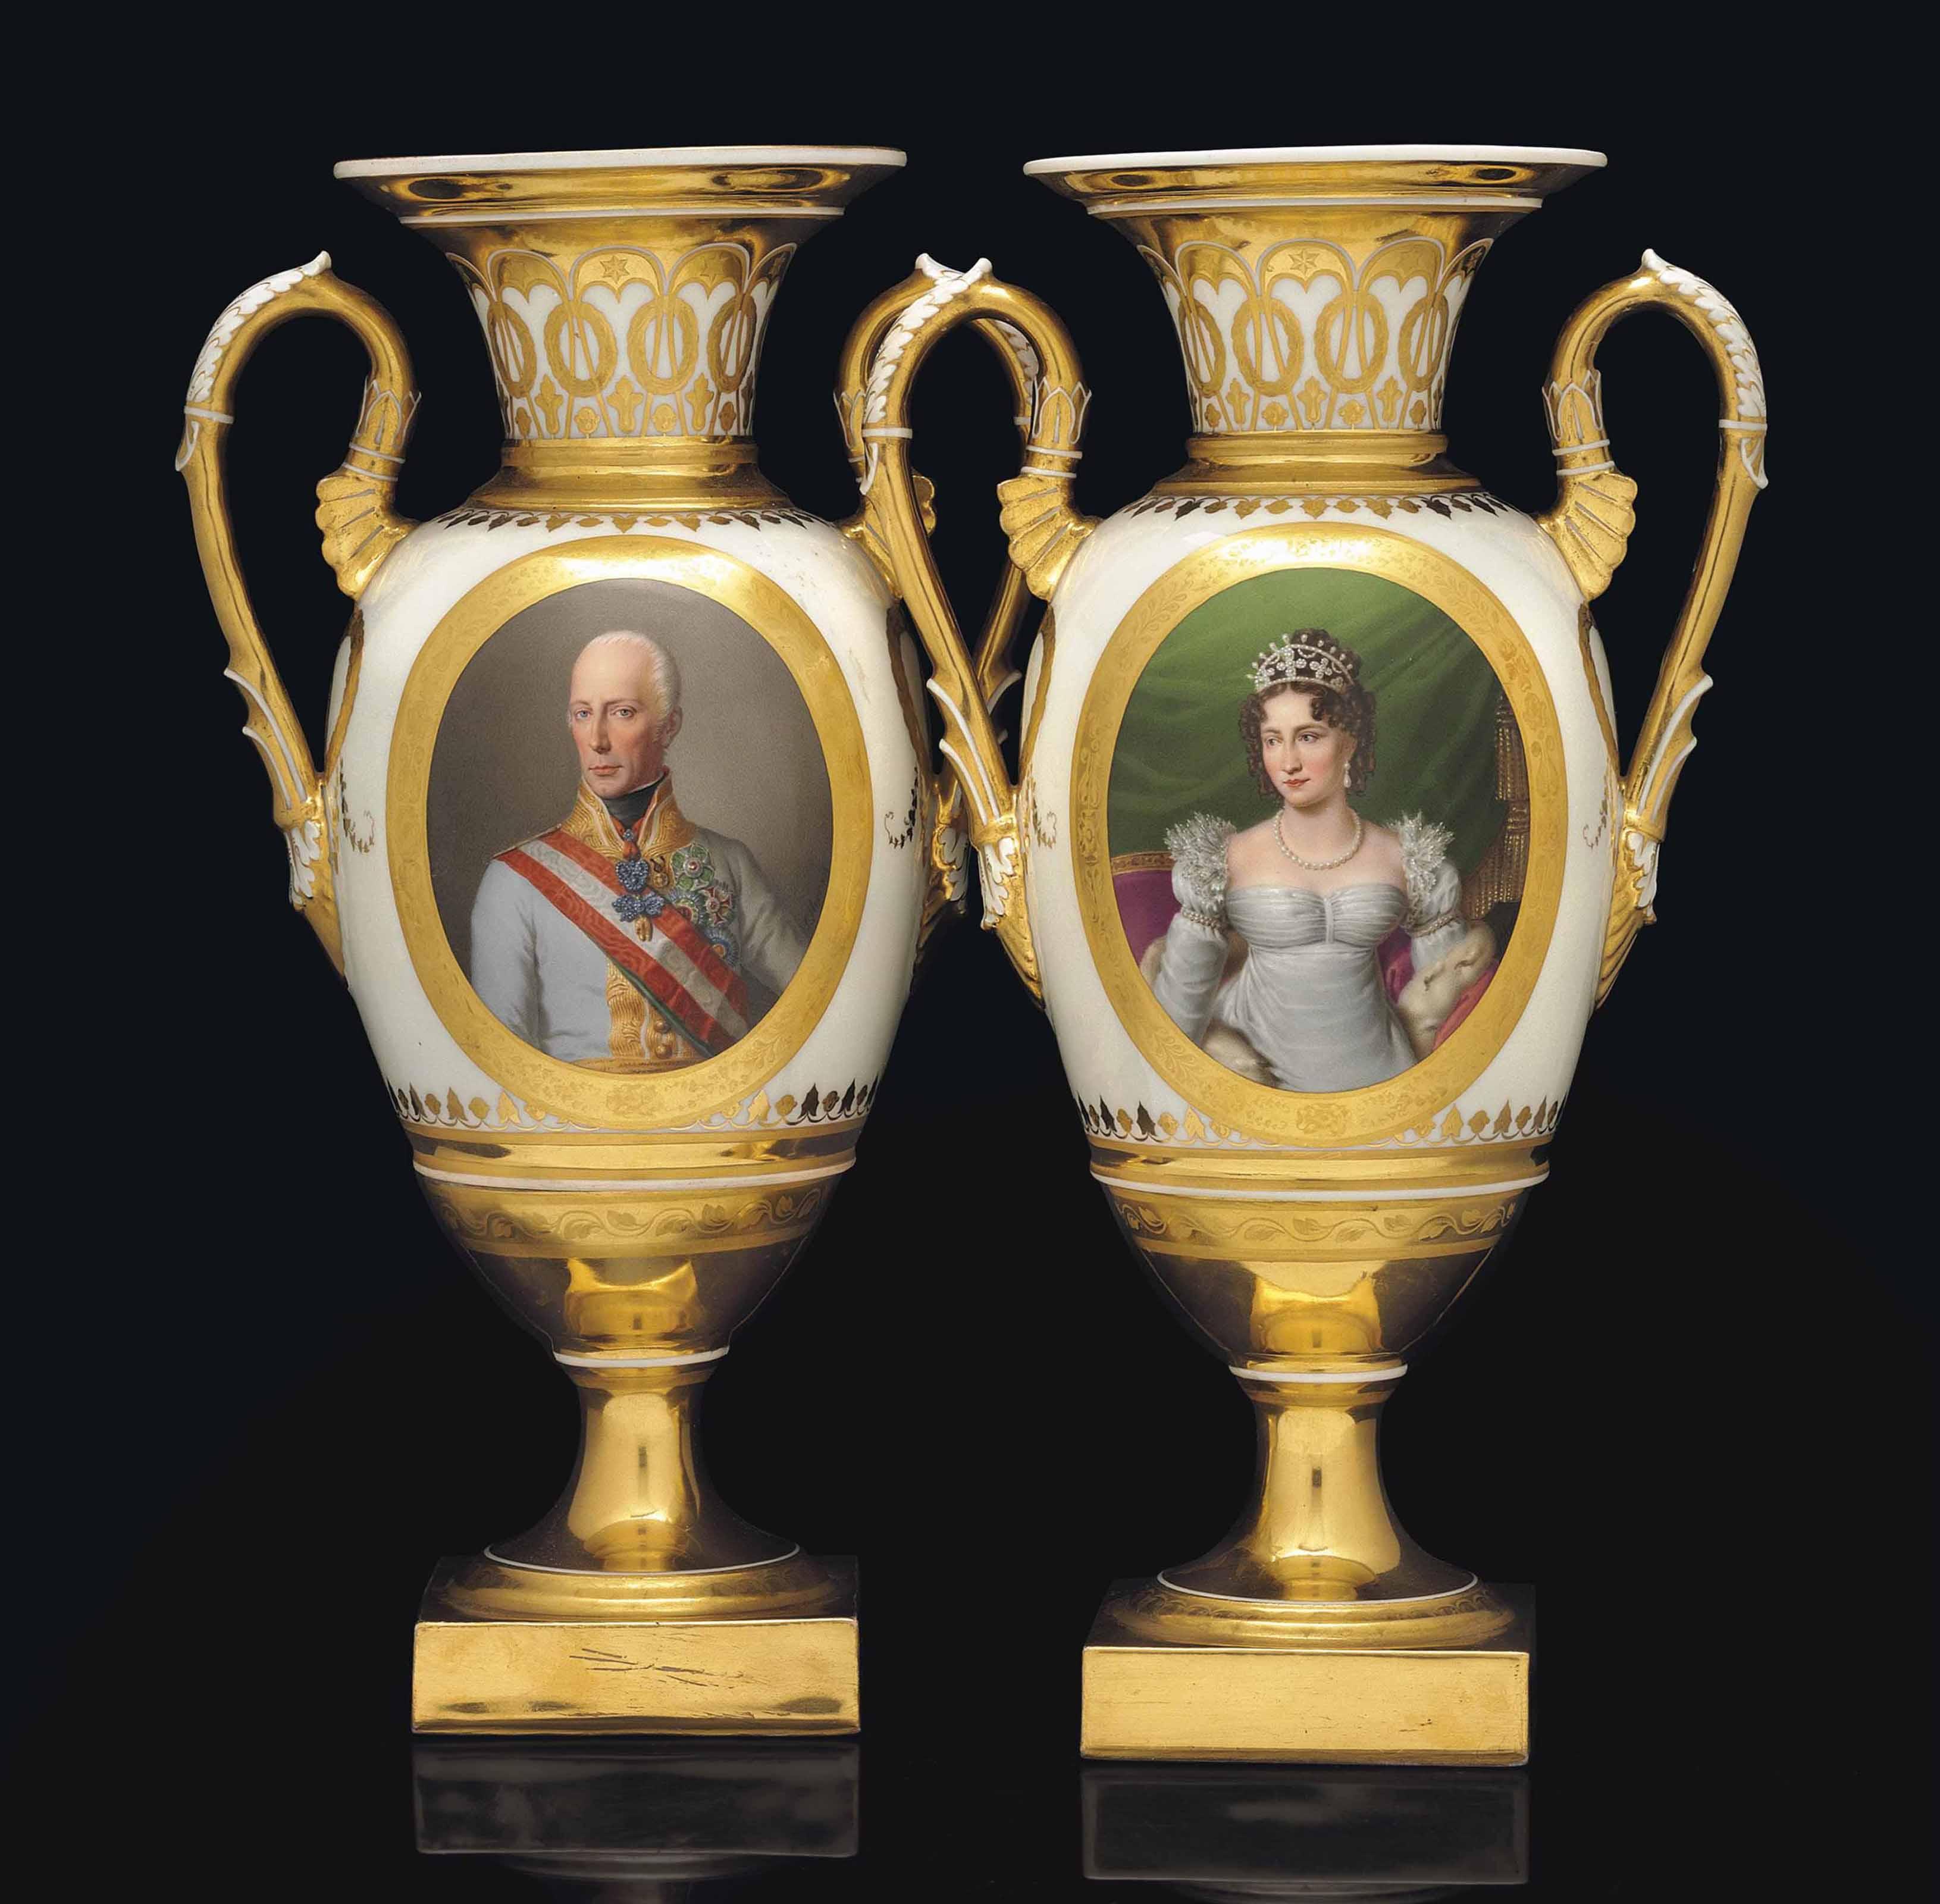 A PAIR OF VIENNA IMPERIAL PORTRAIT VASES OF EMPEROR FRANZ I AND EMPRESS KAROLINE AUGUSTE OF AUSTRIA